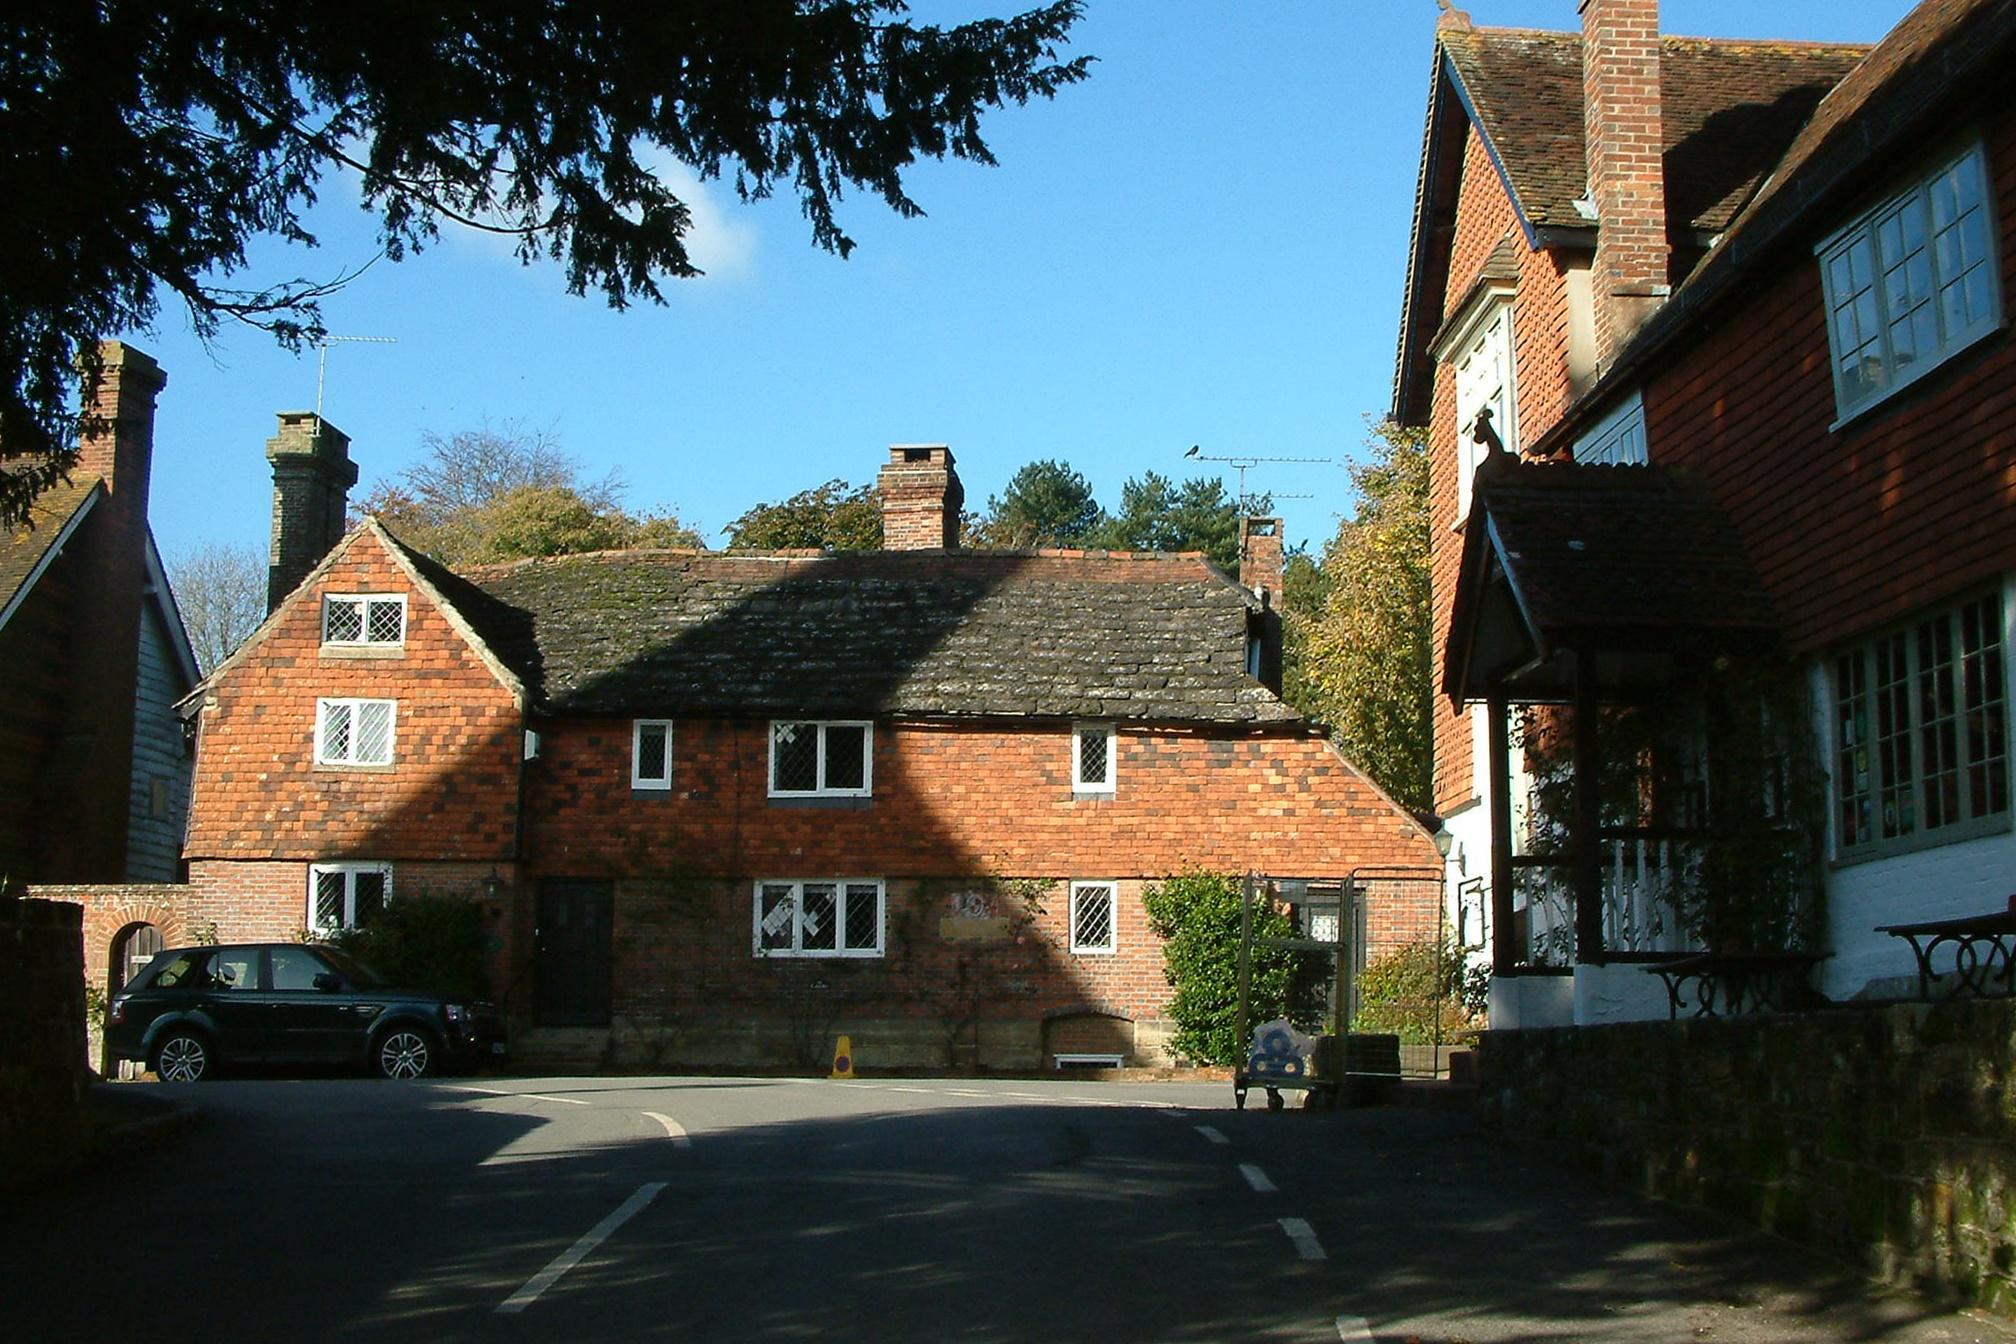 West Hoathly Village